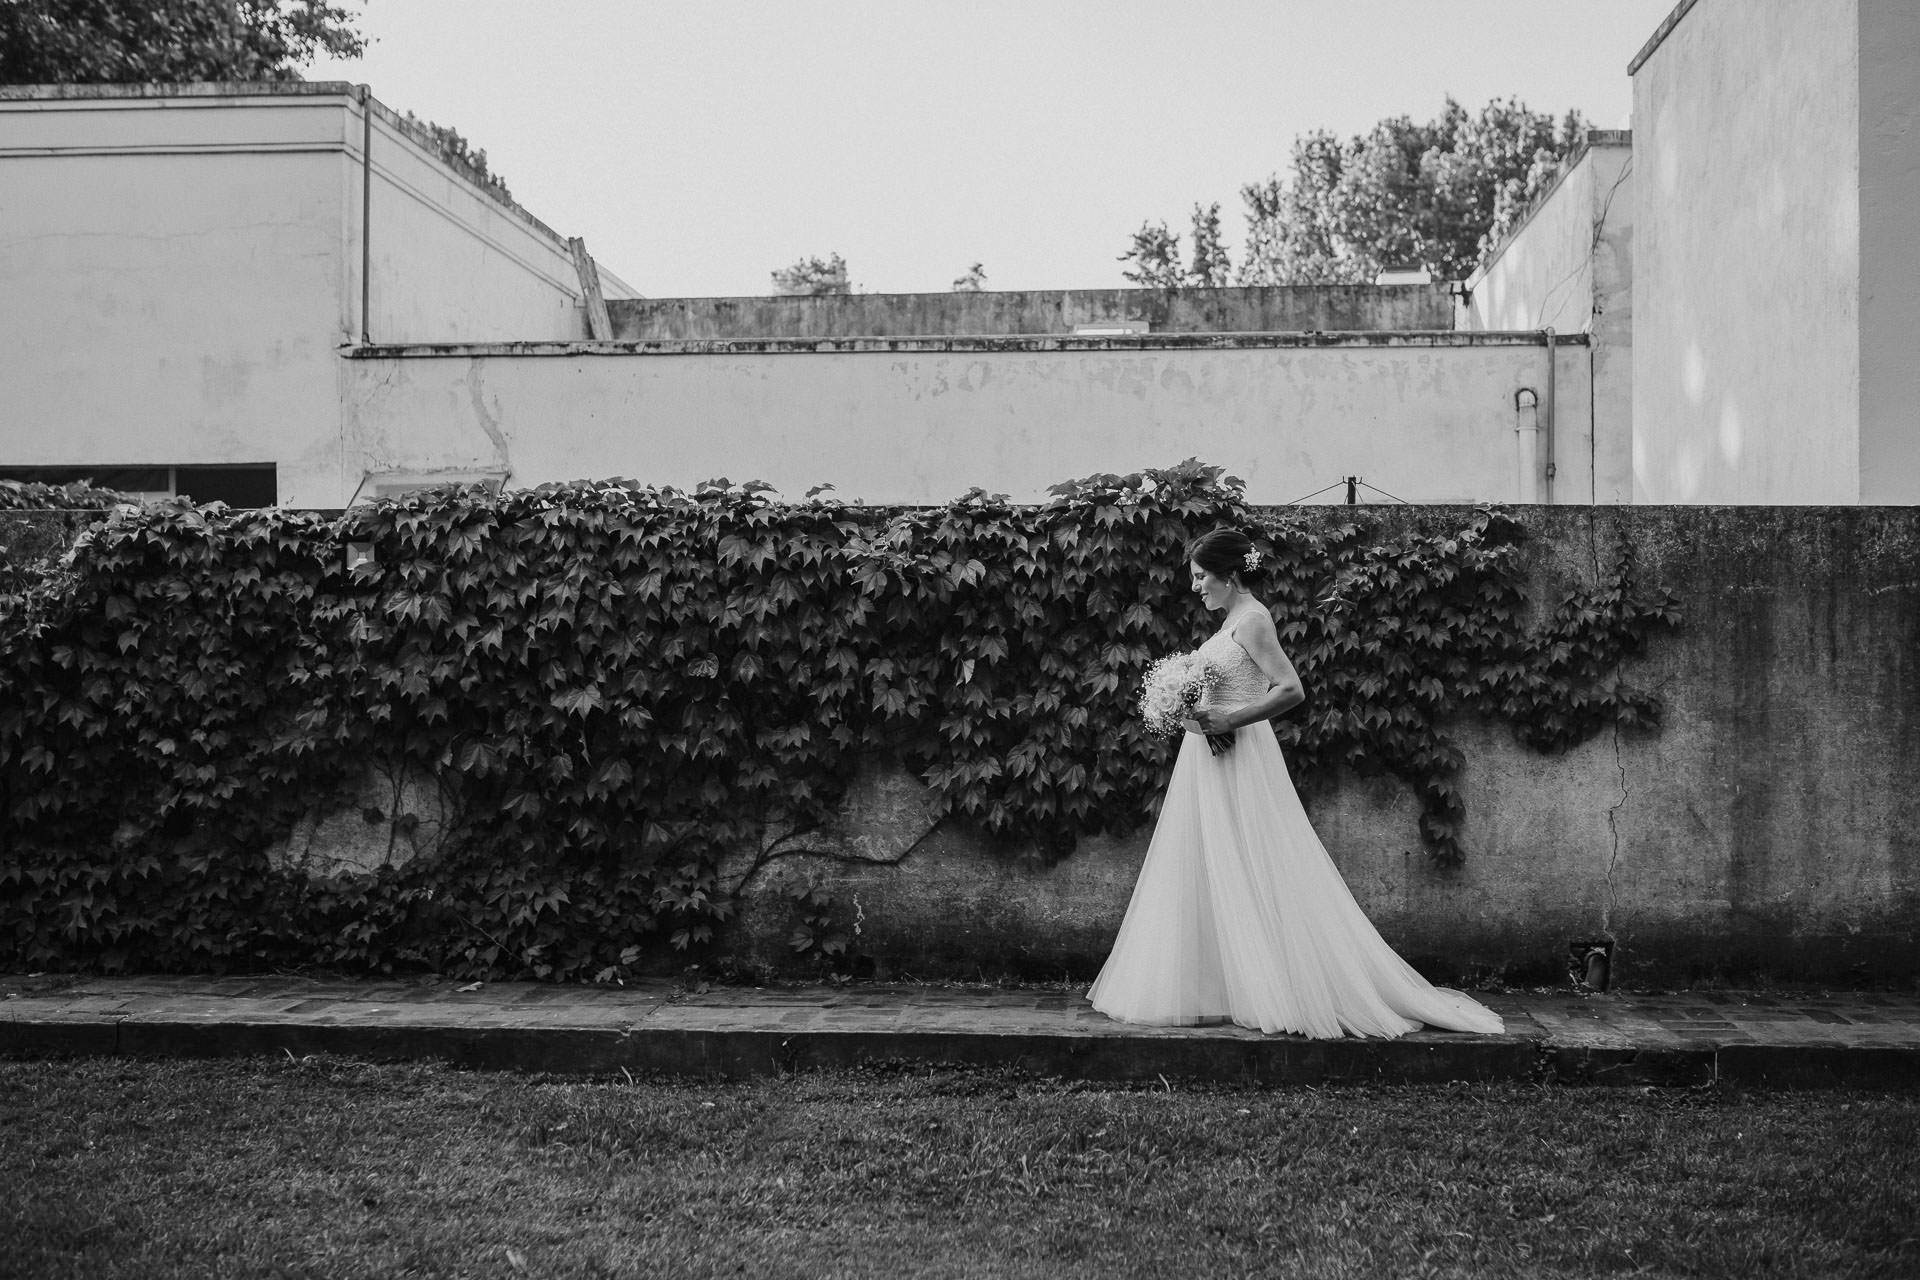 Vestido de novia -Boda en Estancia La Linda, fotógrafo de bodas - Norman Parunov